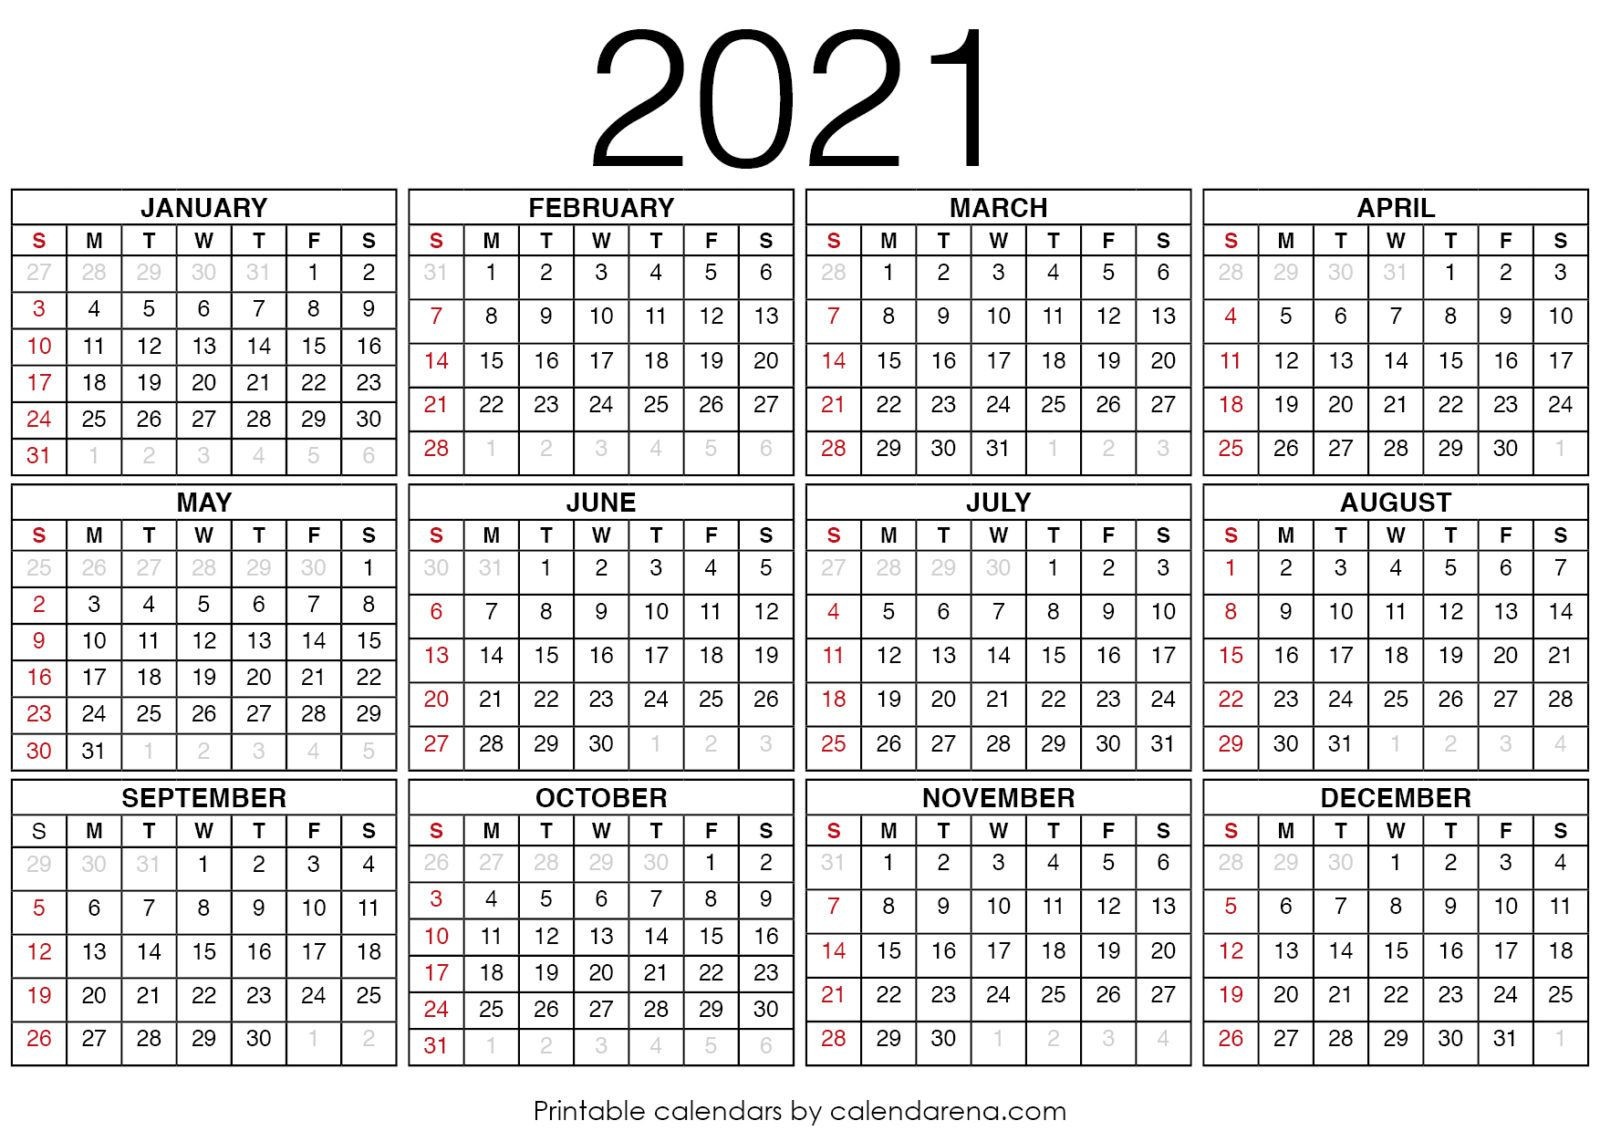 2021 Calendars : Blank Calendar Printable | Calendar  Printable 2021 2021 Depo Calendar